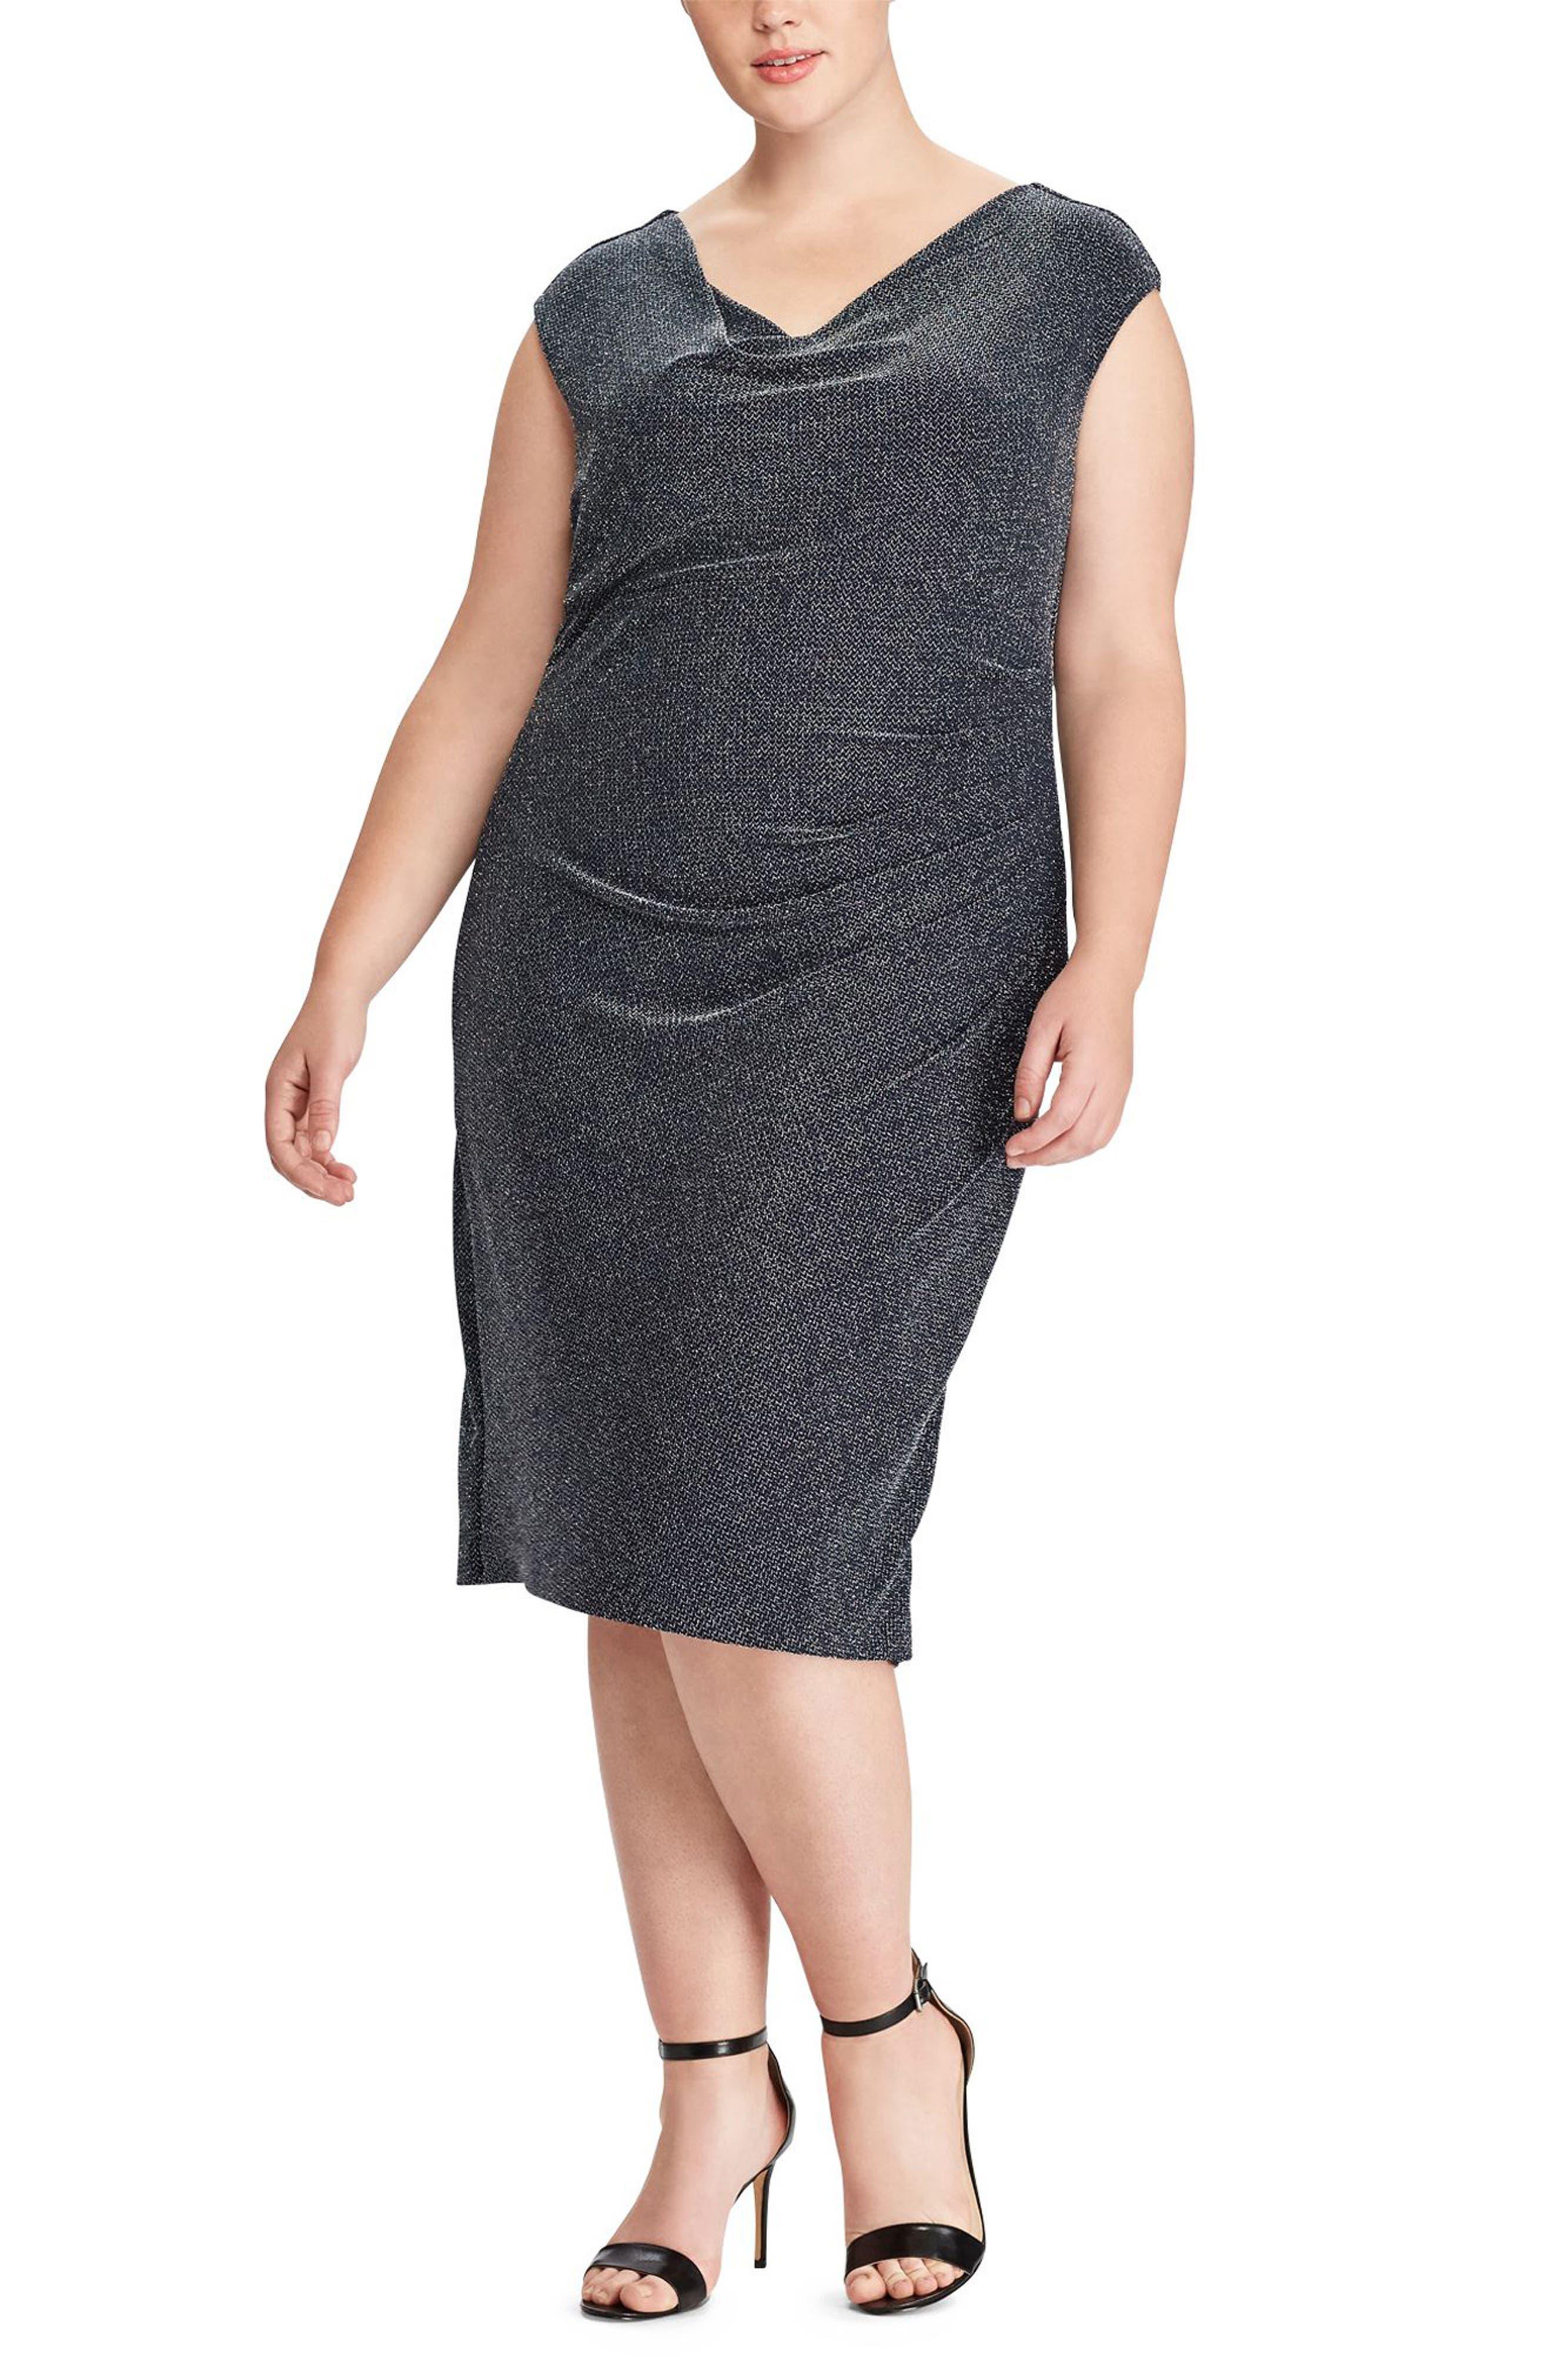 Valli Metallic Knit Dress,                         Main,                         color,